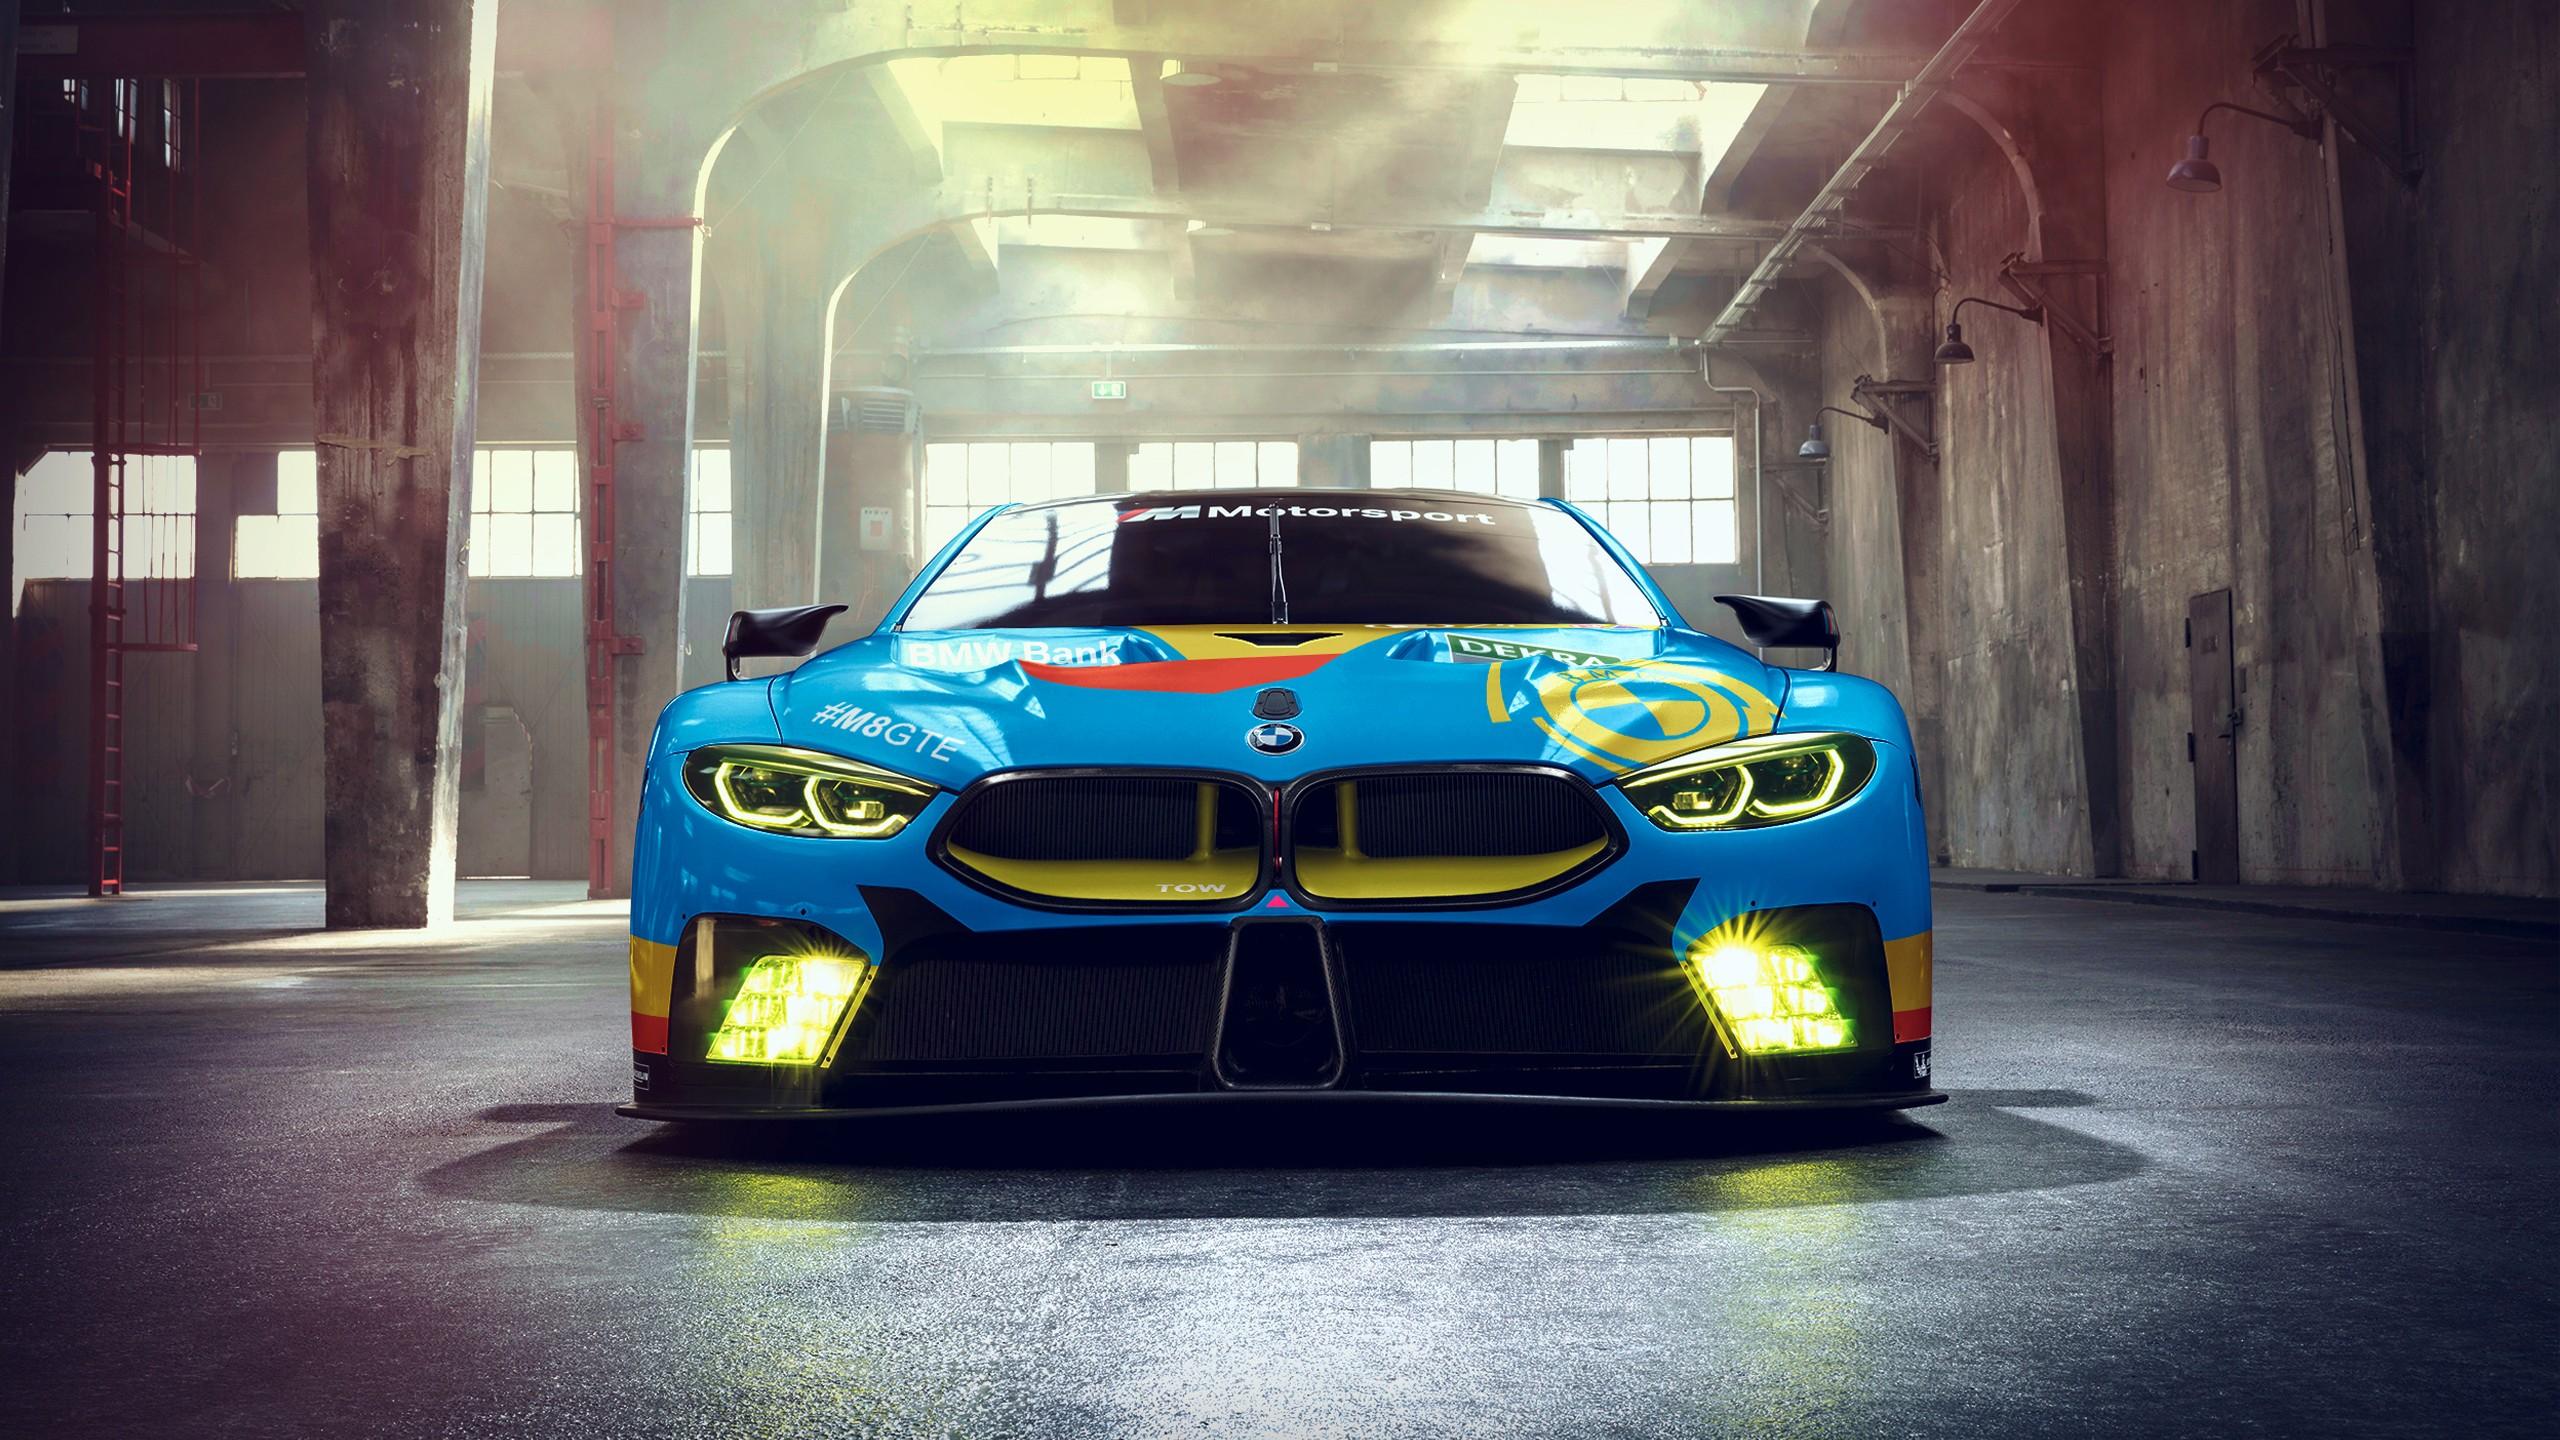 BMW M8 GTE 2018 2 Wallpaper | HD Car Wallpapers | ID #9273